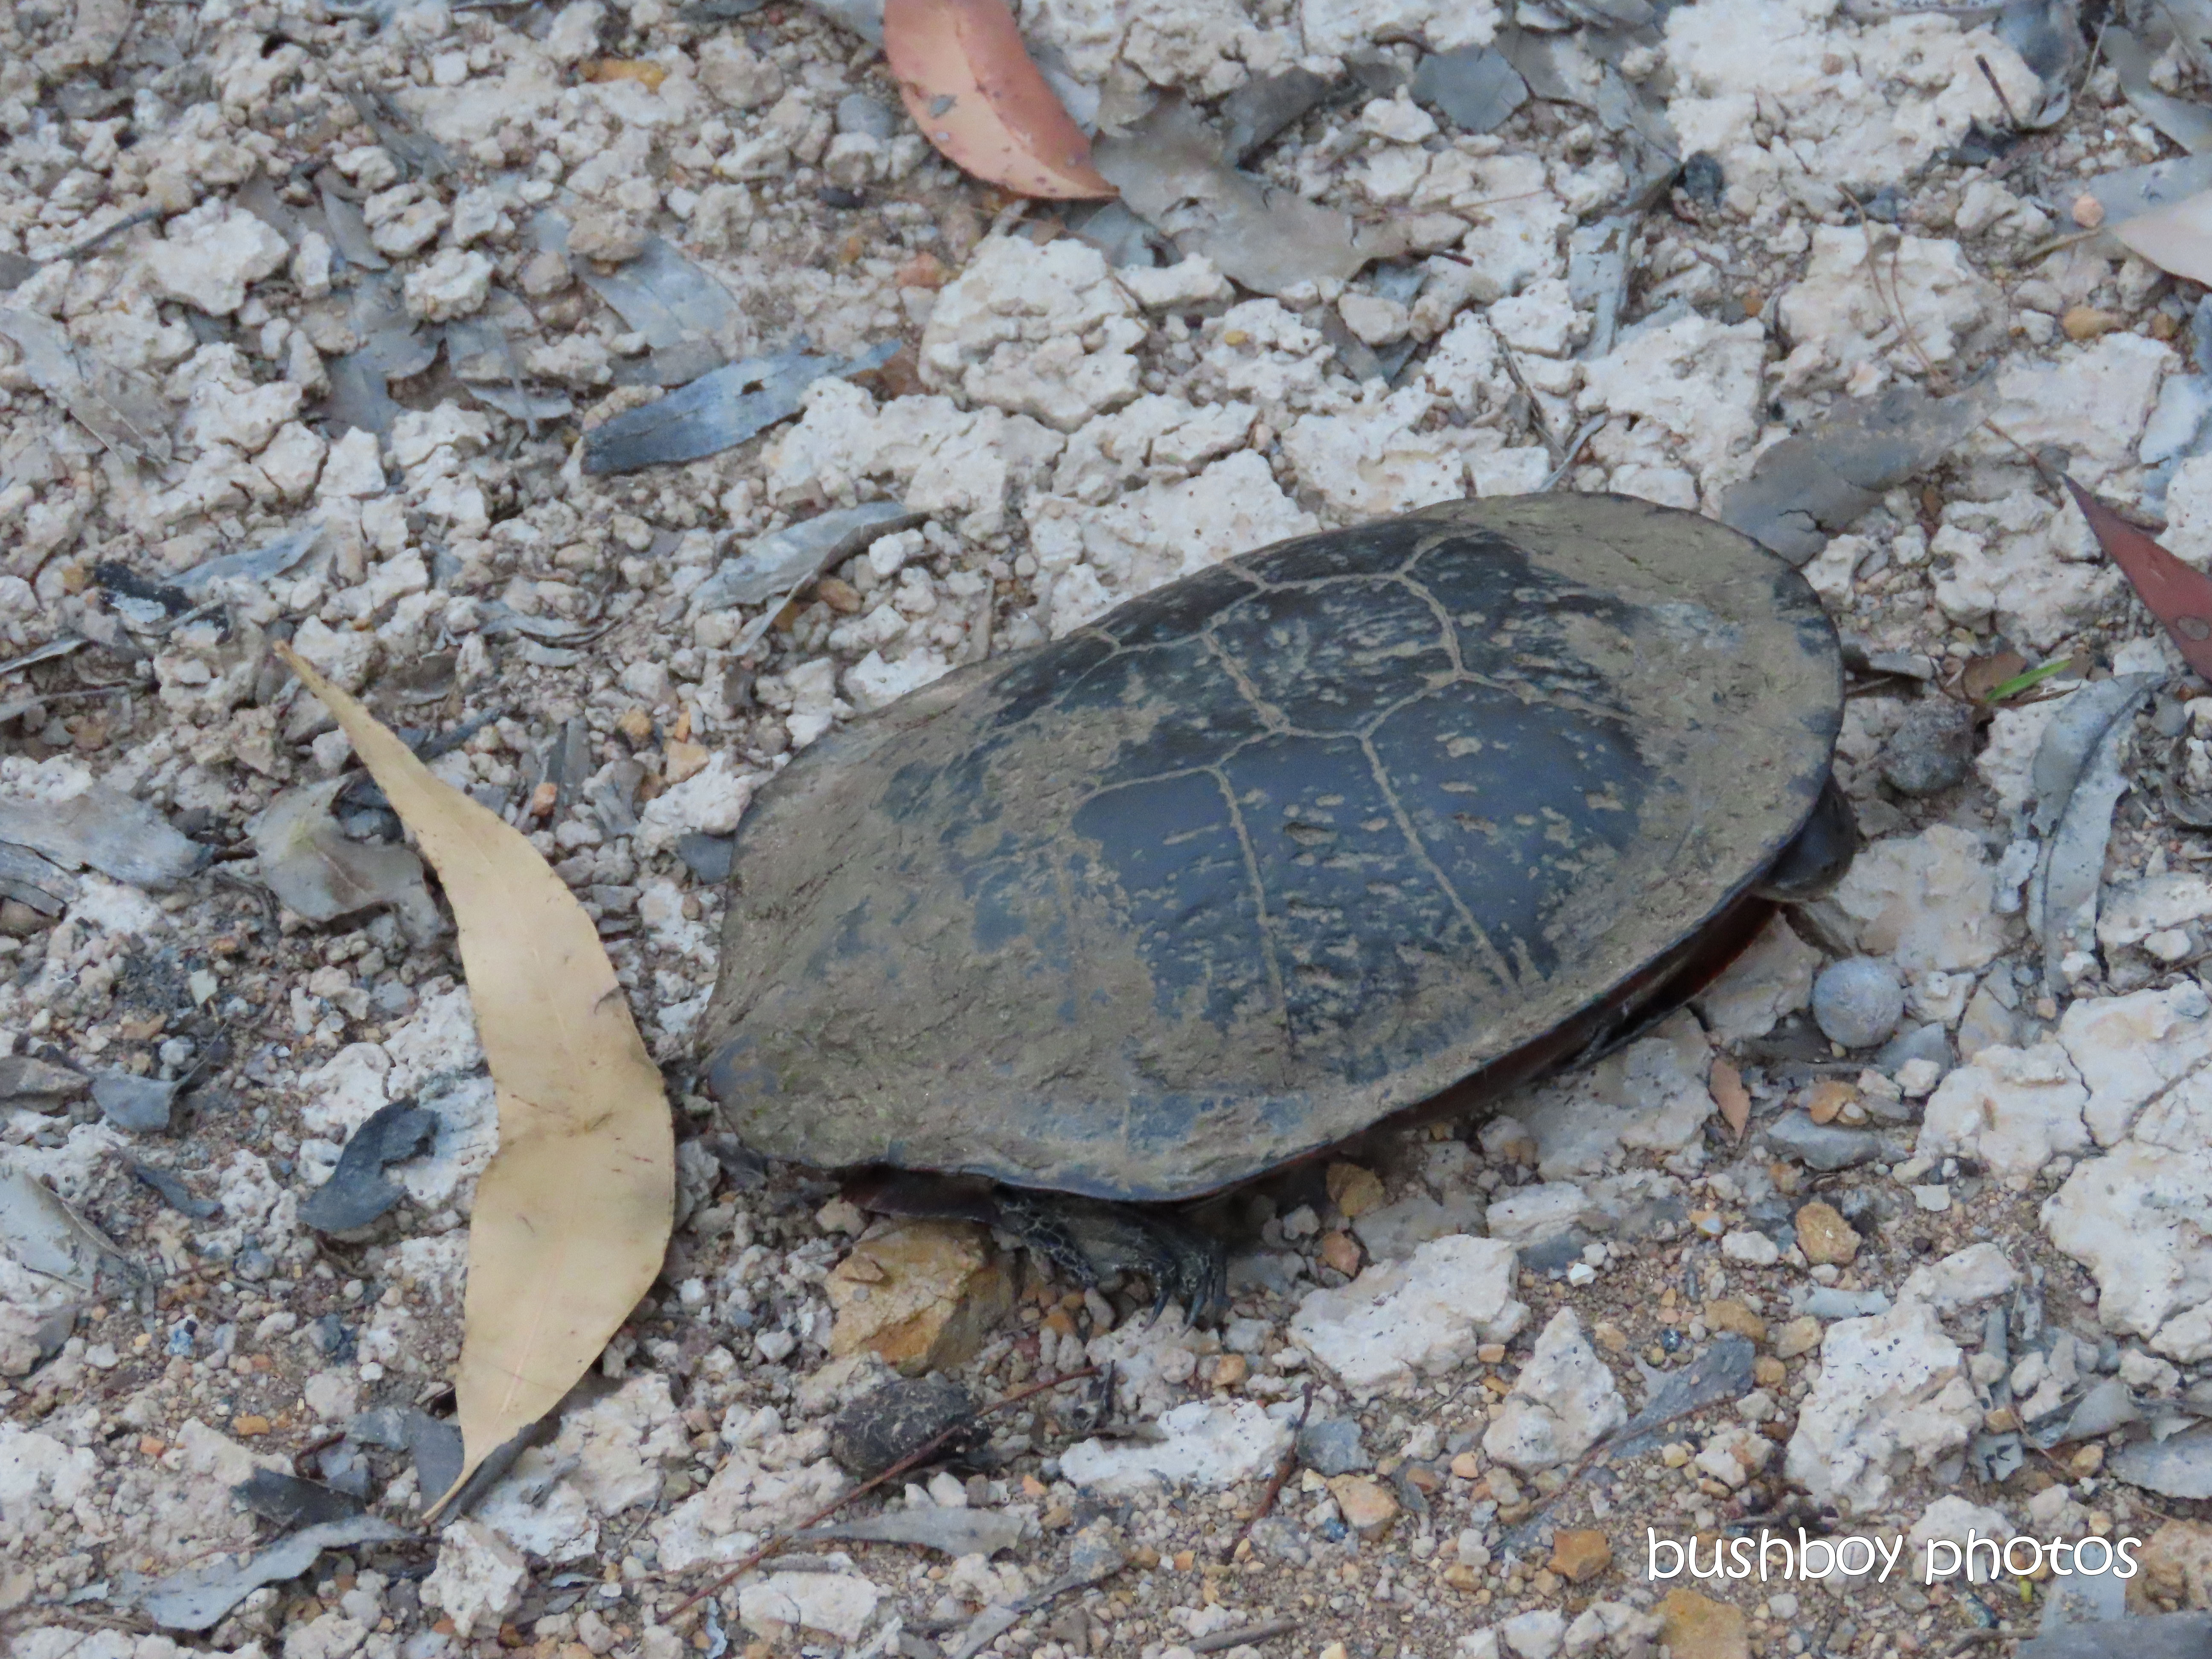 long-necked tortoise_rescue_dam_shell_named_home_jackadgery_oct 2019